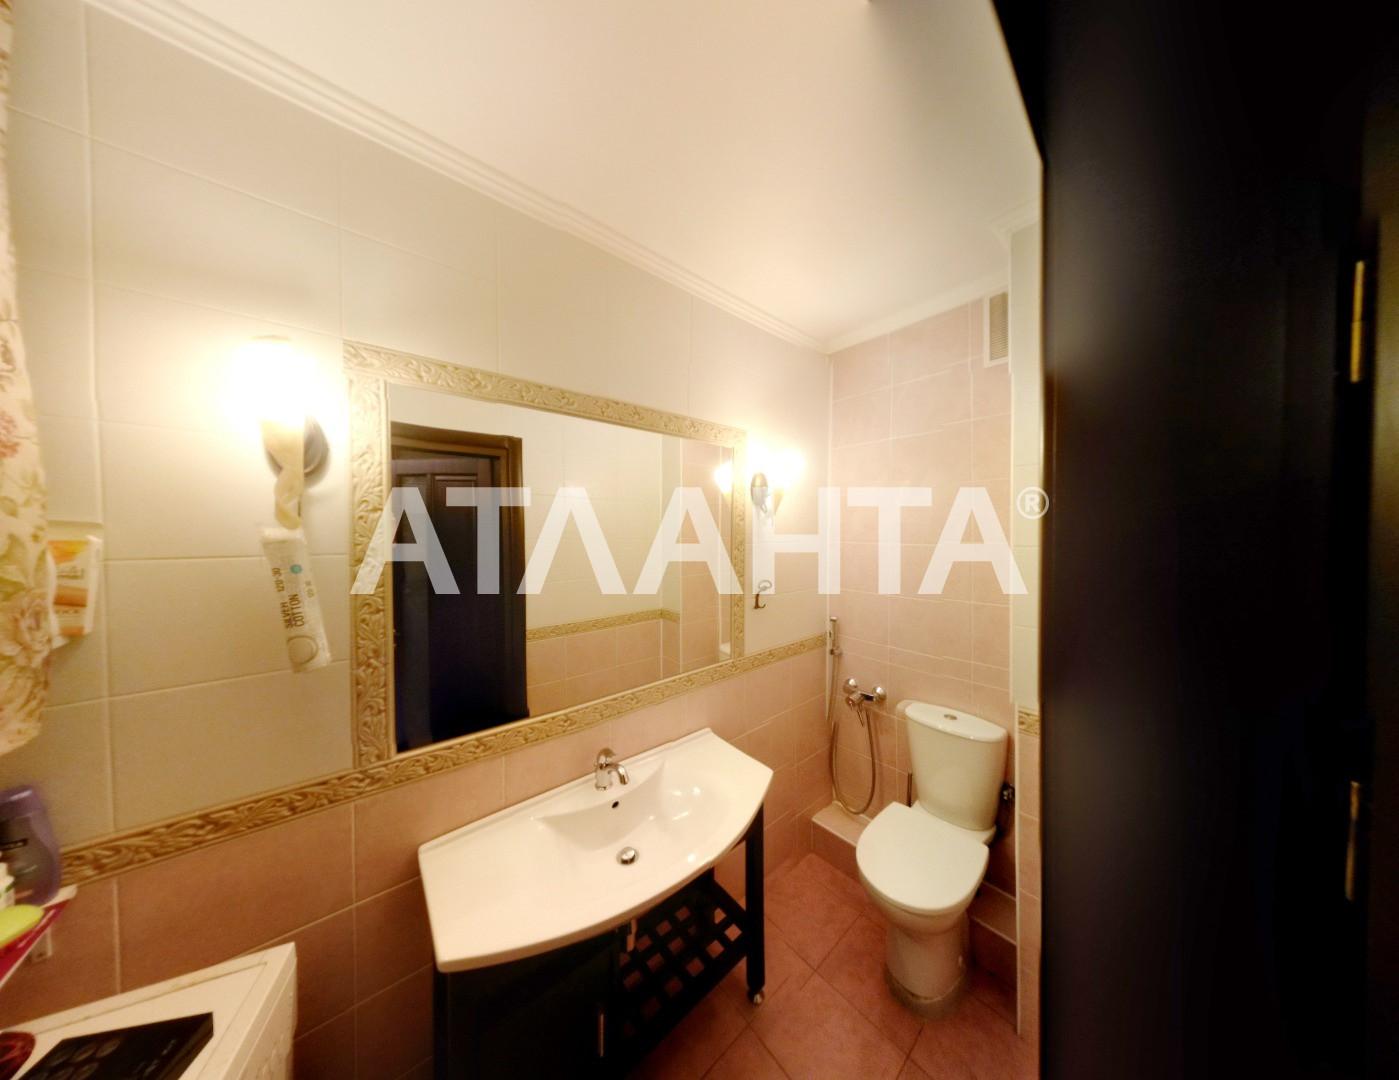 Продается 3-комнатная Квартира на ул. Ул. Ломоносова — 139 600 у.е. (фото №21)